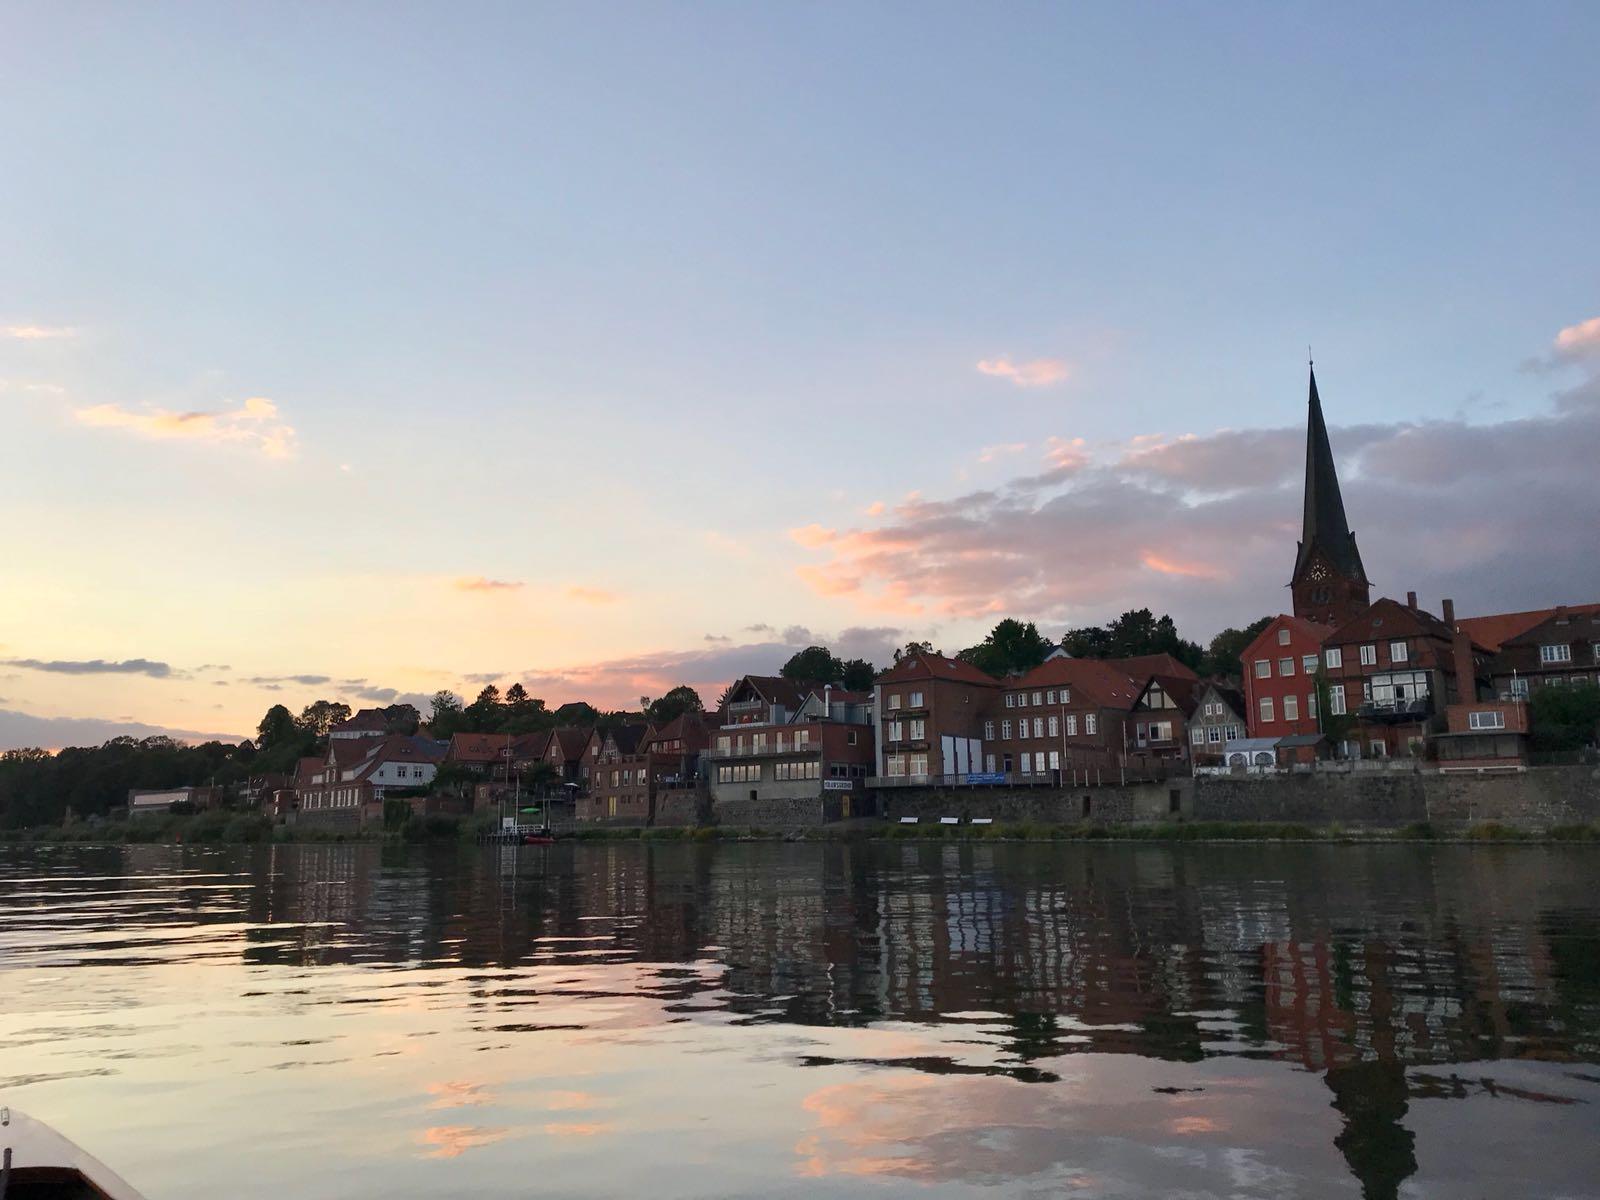 Lauenburgs malerische Altstadt zur Funkelstunde